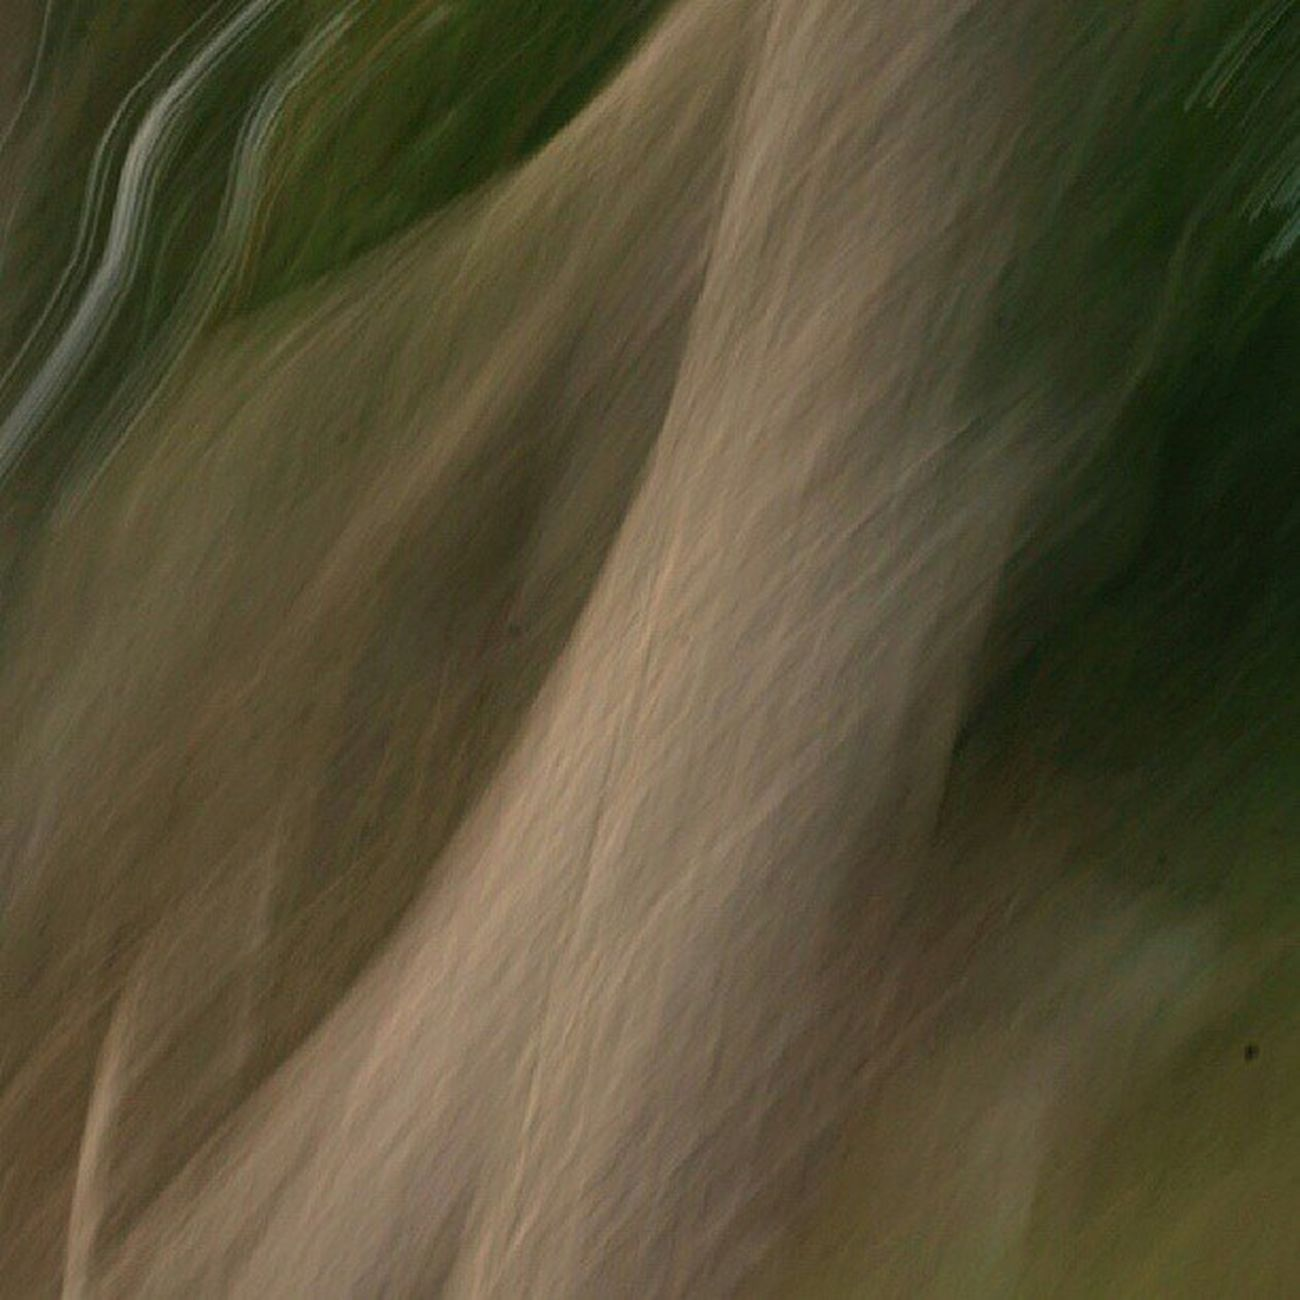 Ic_longexpo Ic_trees Igersgothenburg Igers insta_crew art_feeling fineartstorage fingerprintofgod mostdeserving